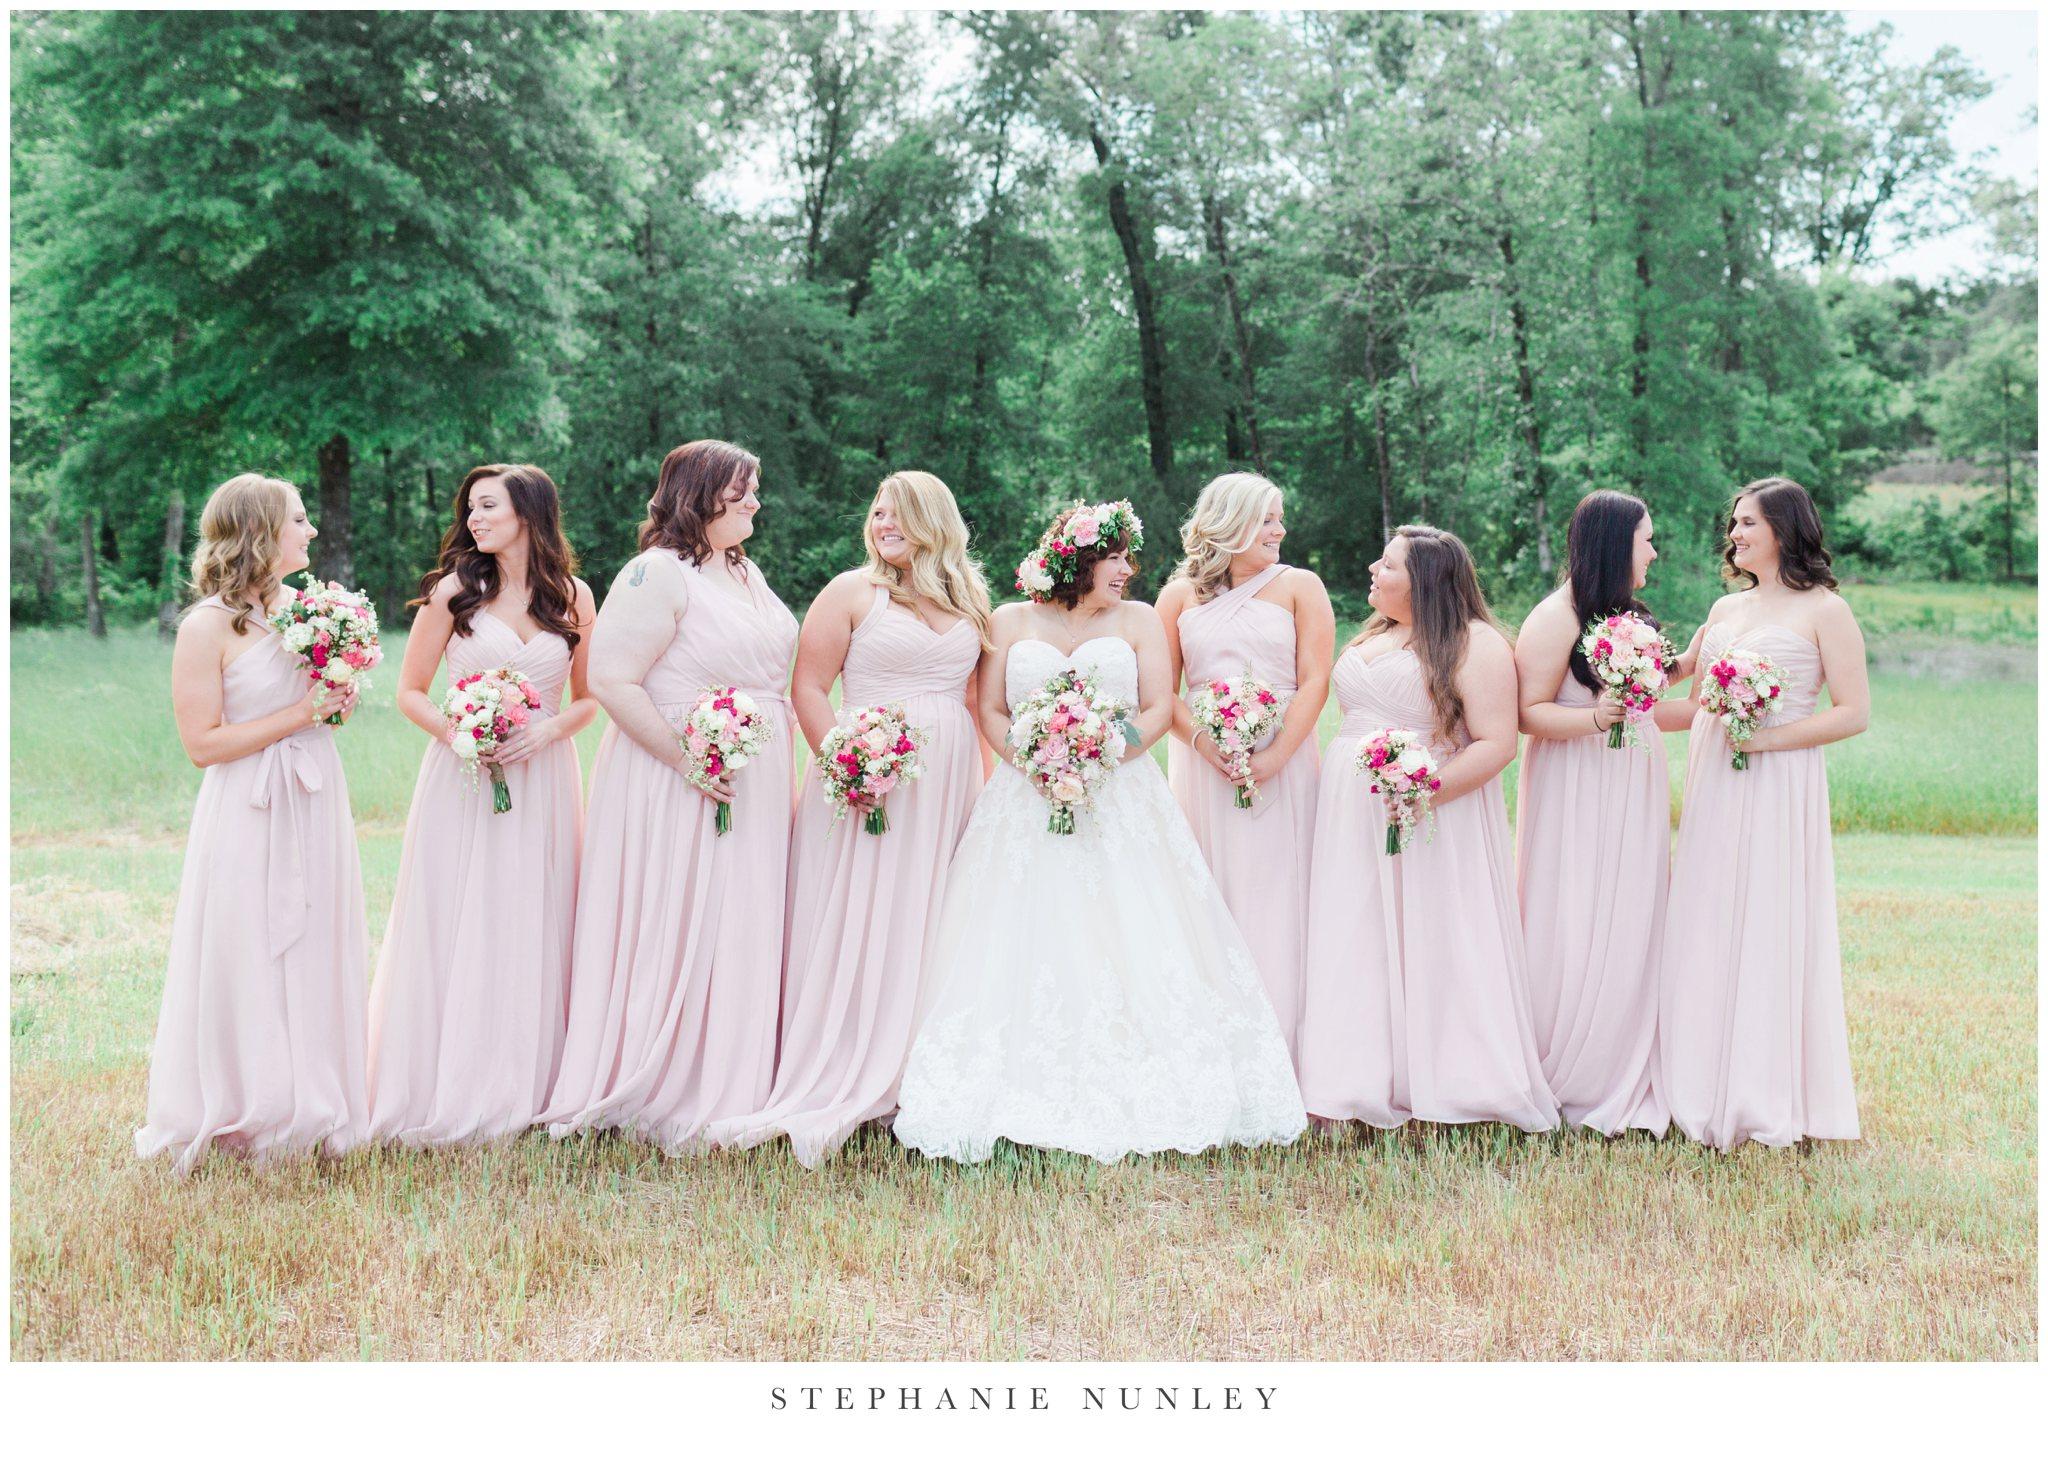 romantic-outdoor-wedding-with-flower-crown-0076.jpg